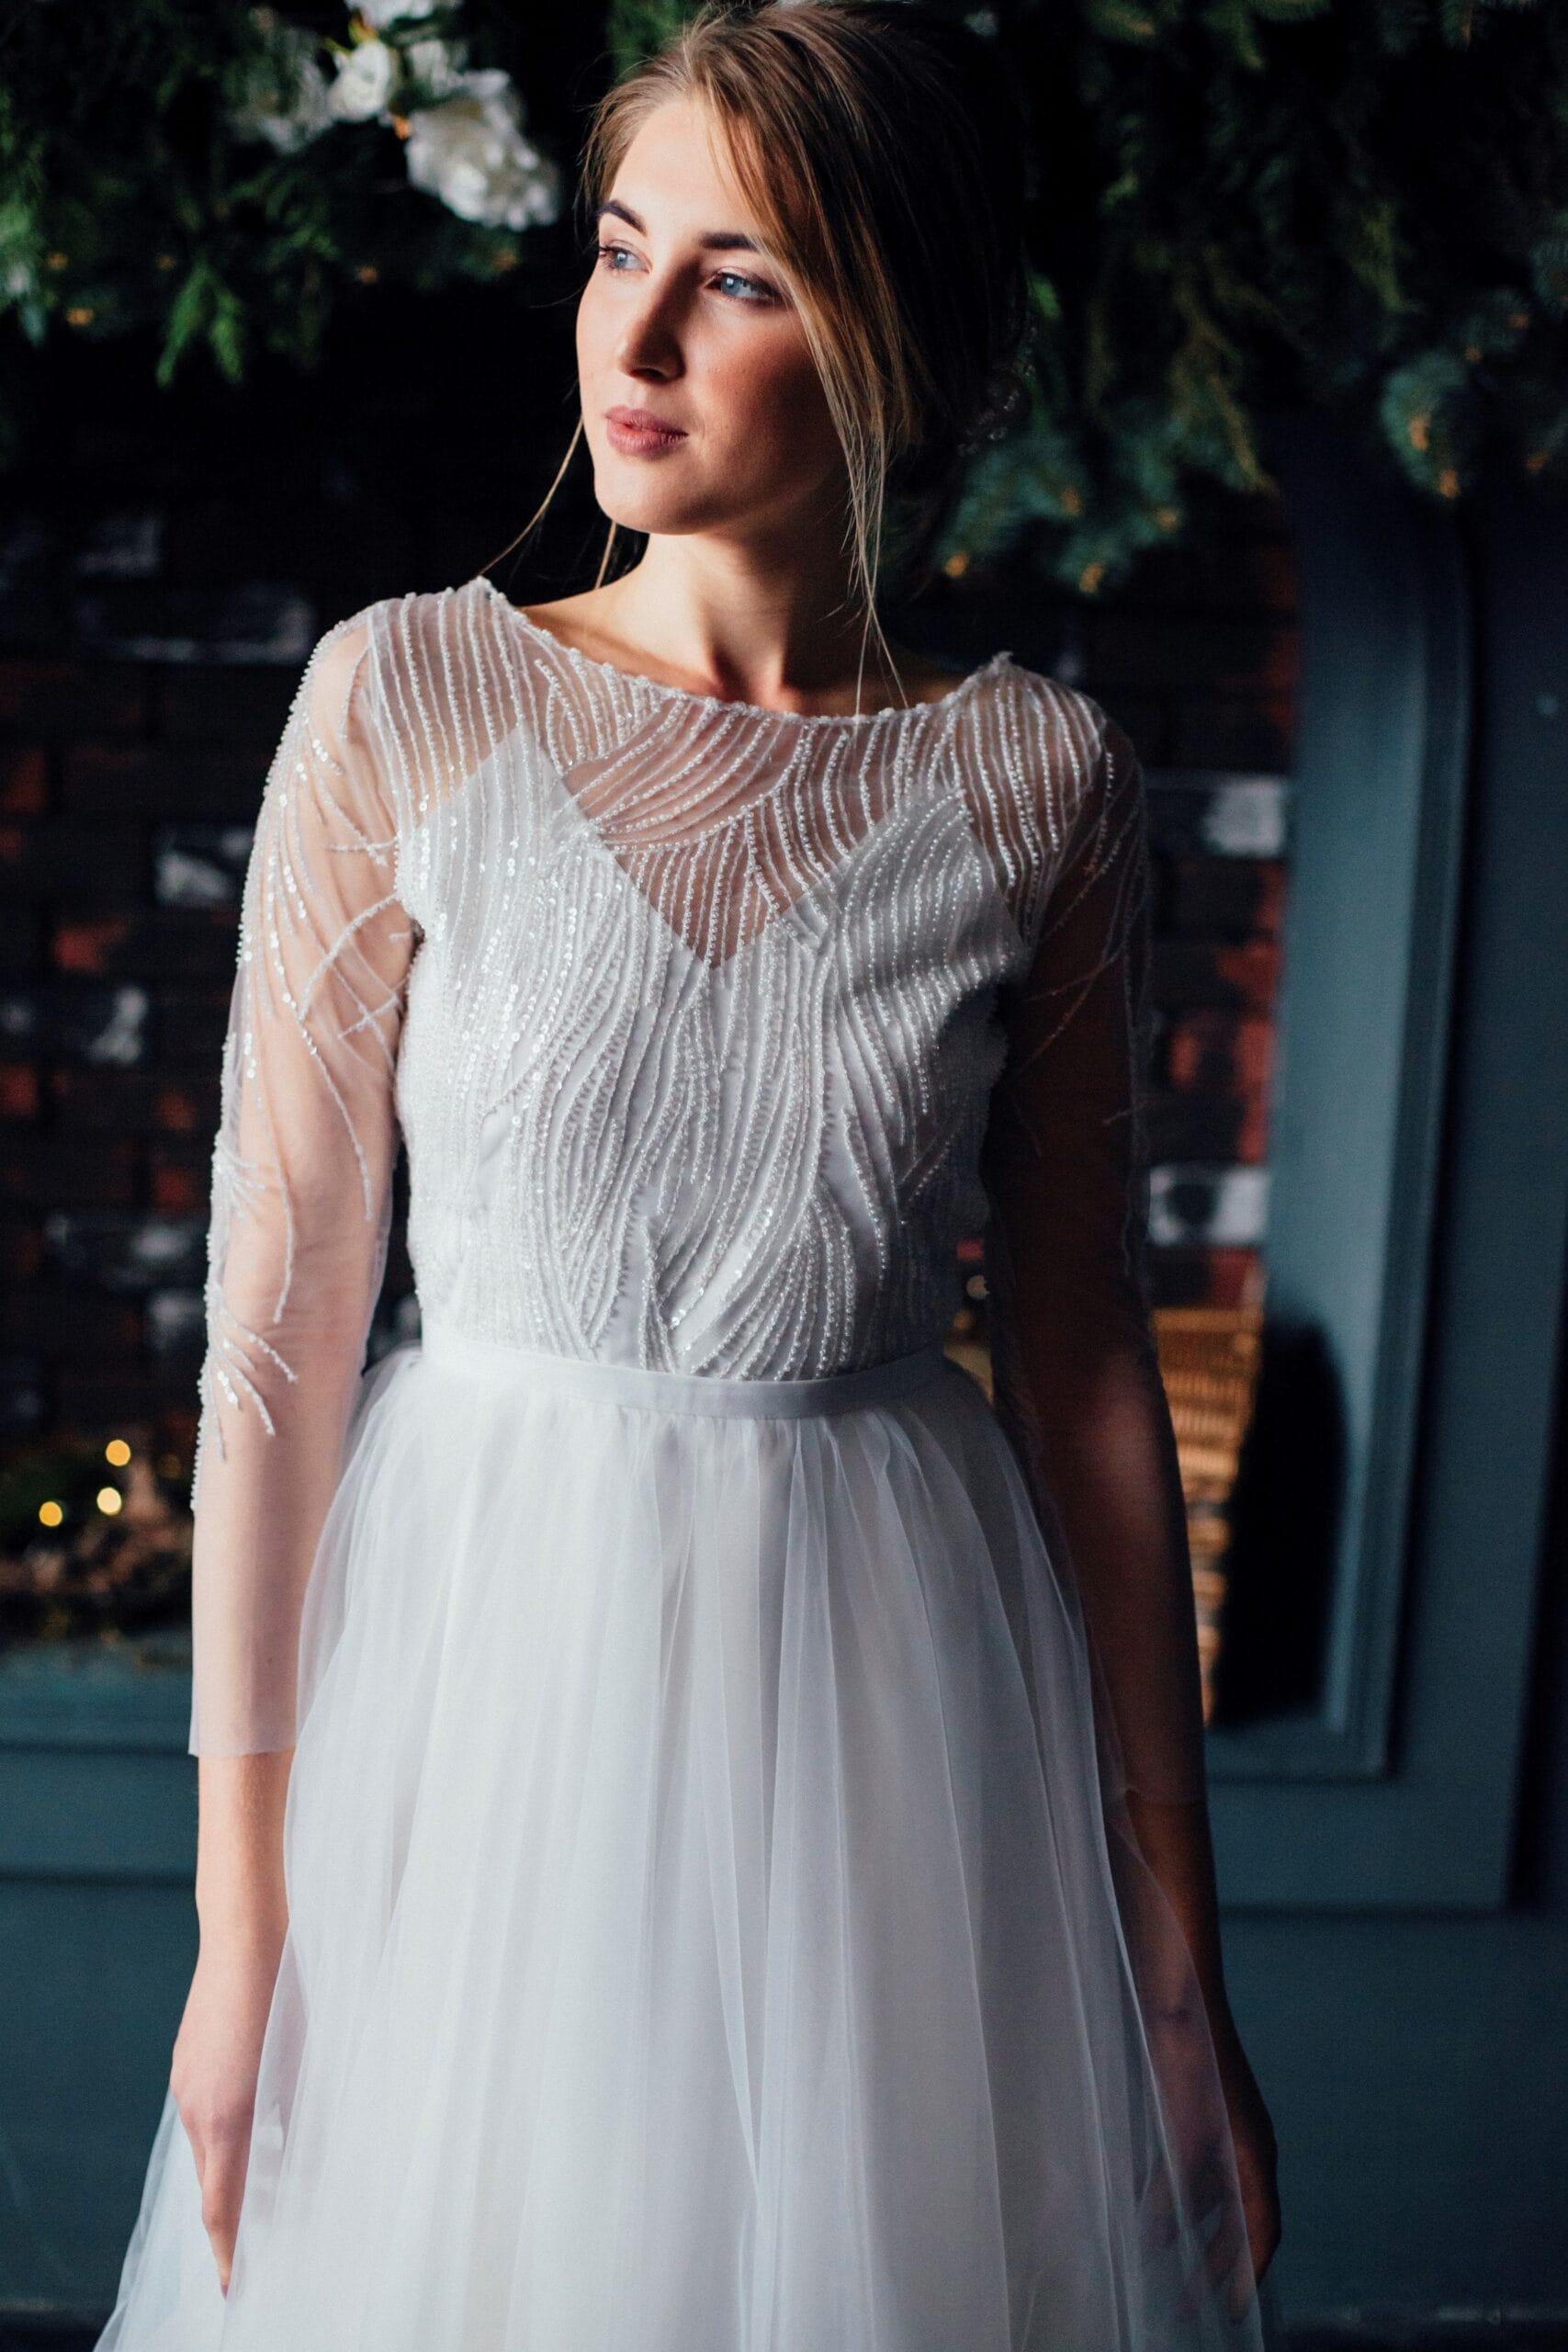 Свадебное платье EVELYN, коллекция THE ABSOLUTE LOVE, бренд RARE BRIDAL, фото 3